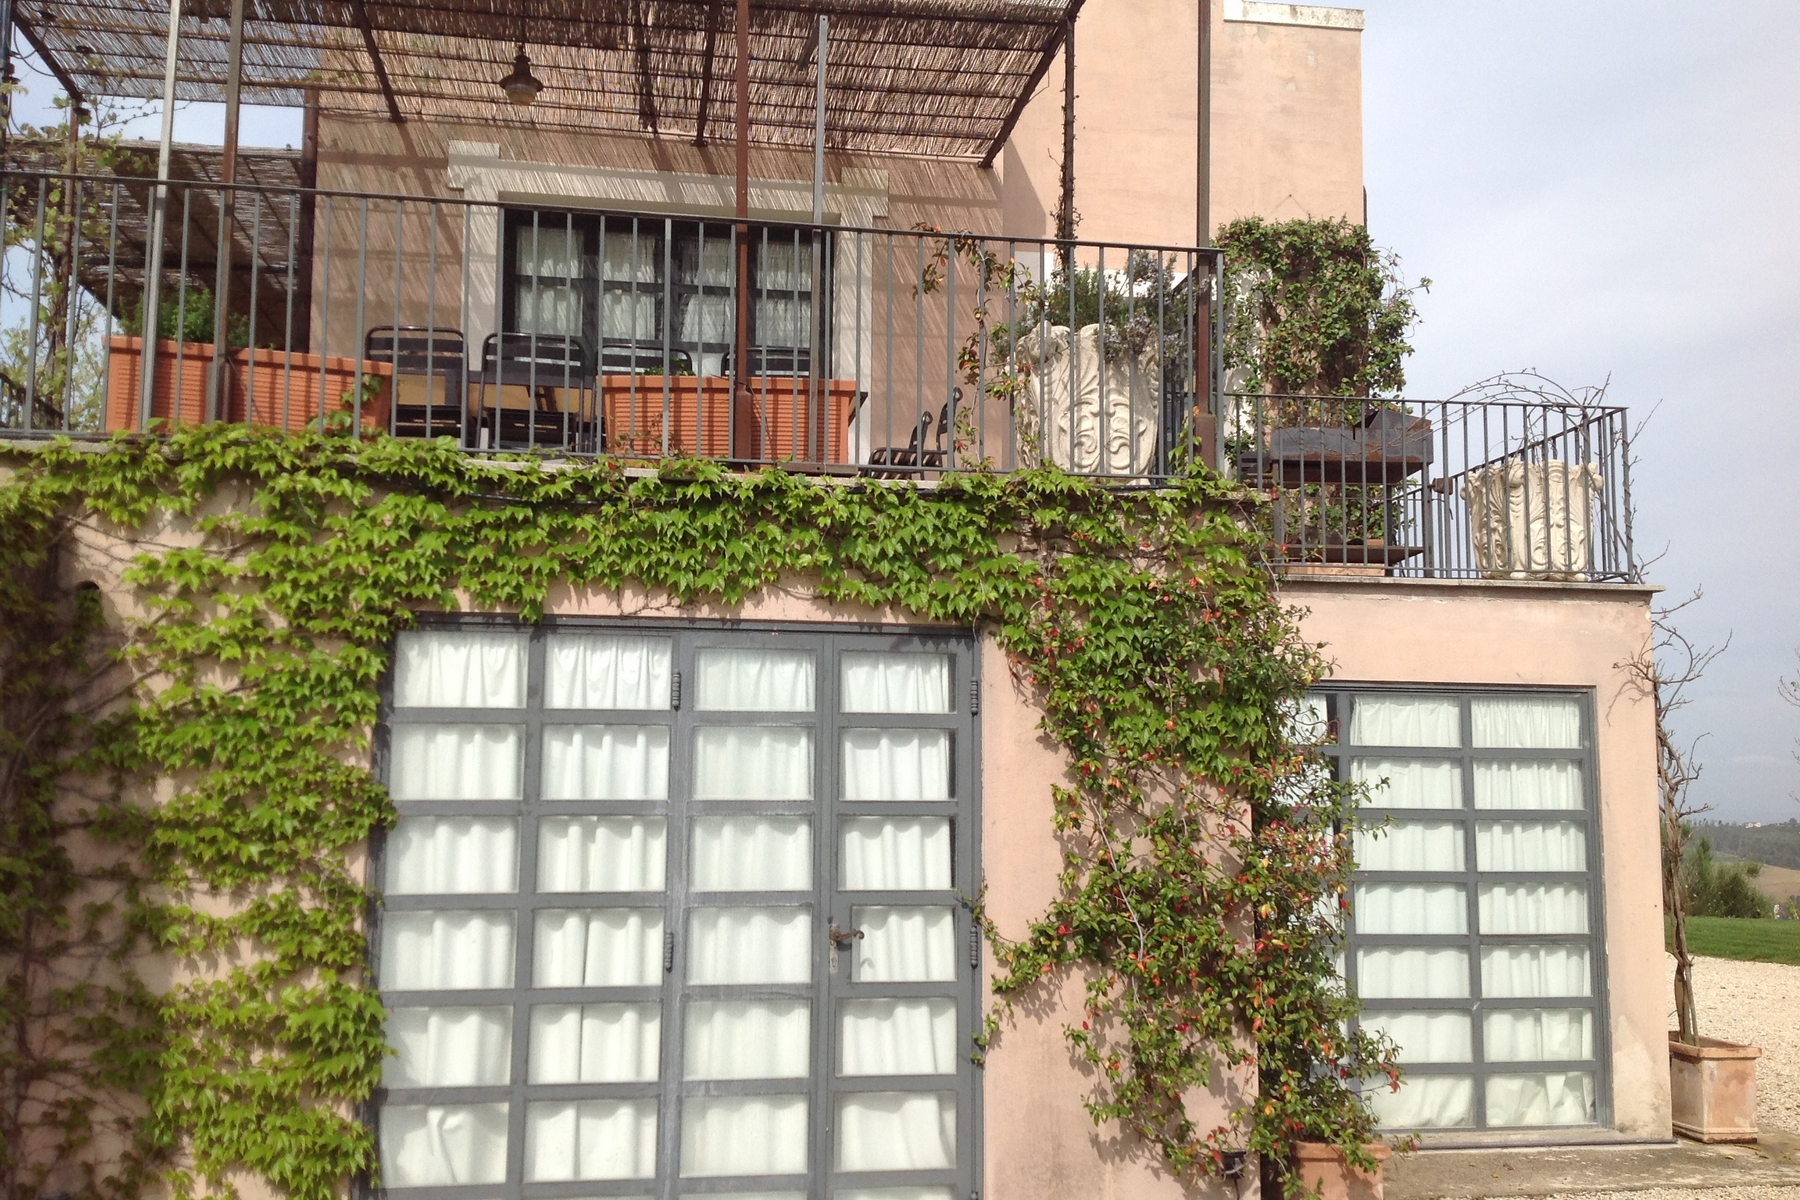 Additional photo for property listing at Splendide villa moderne nichée sur les collines de l'Ombrie Gaglietole Collazzone, Perugia 06050 Italie